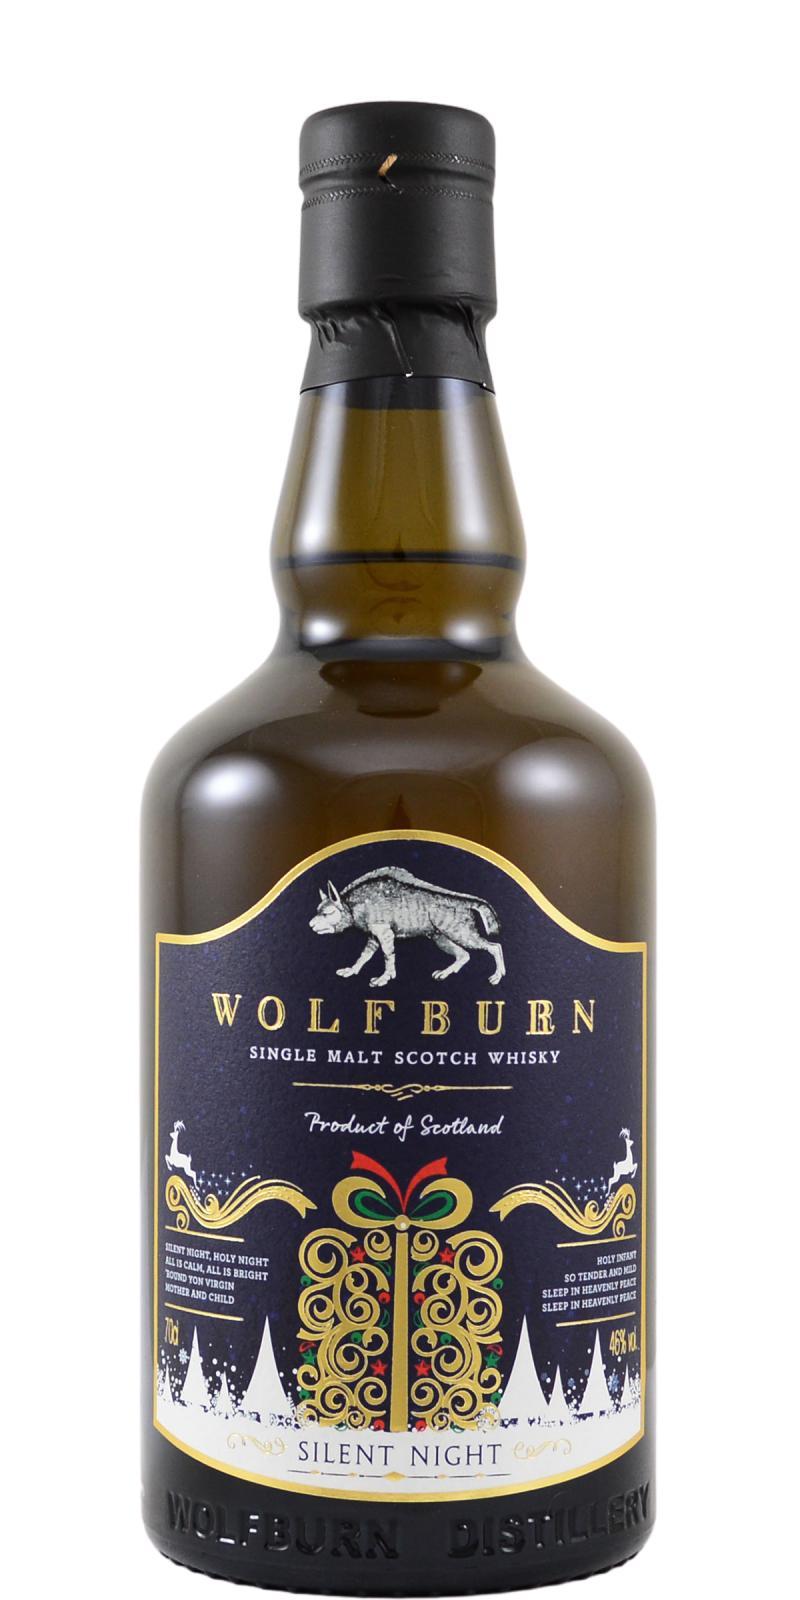 Wolfburn Silent Night